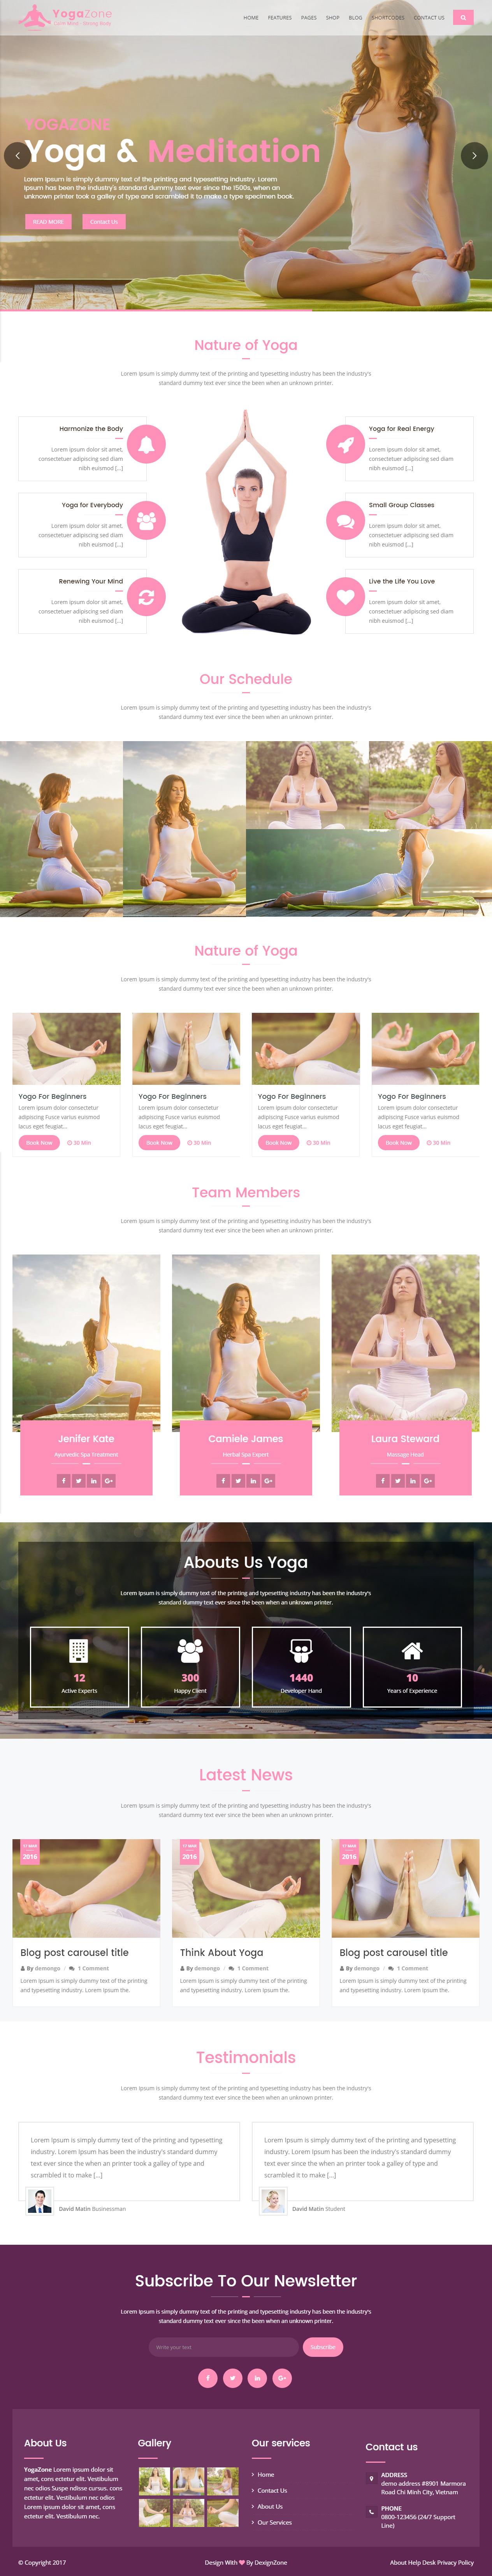 Best Responsive HTML5 Yoga Website Templates 2017 - Responsive Miracle